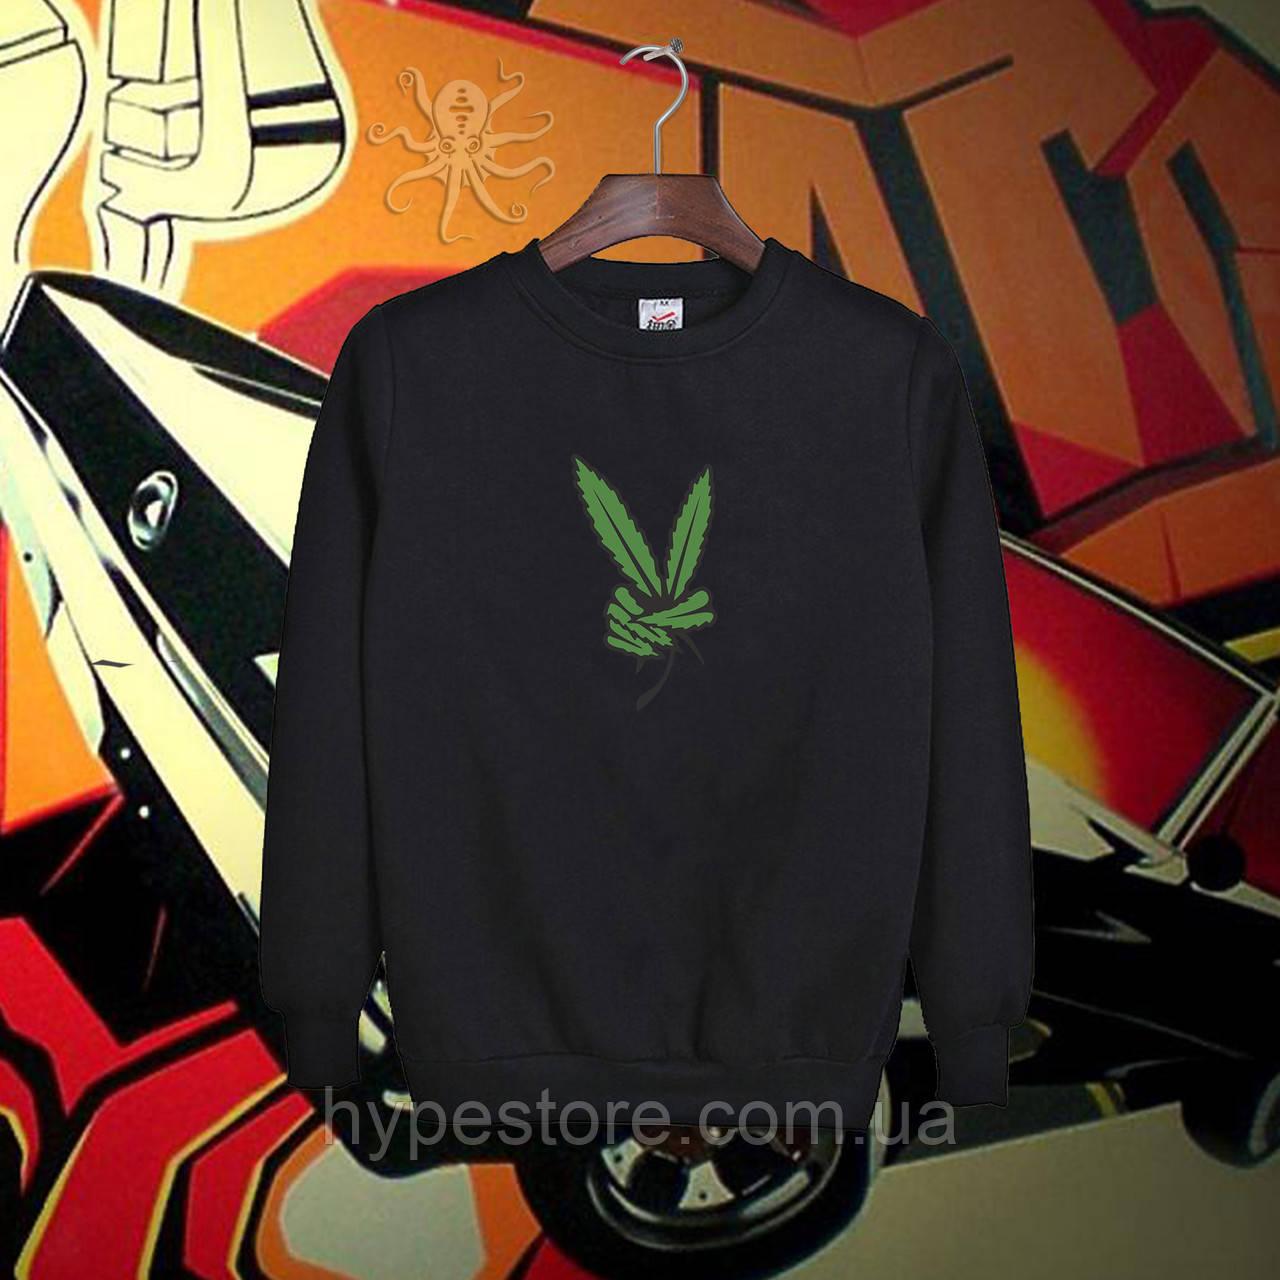 Бренд марихуана одежда конопля отпусти меня